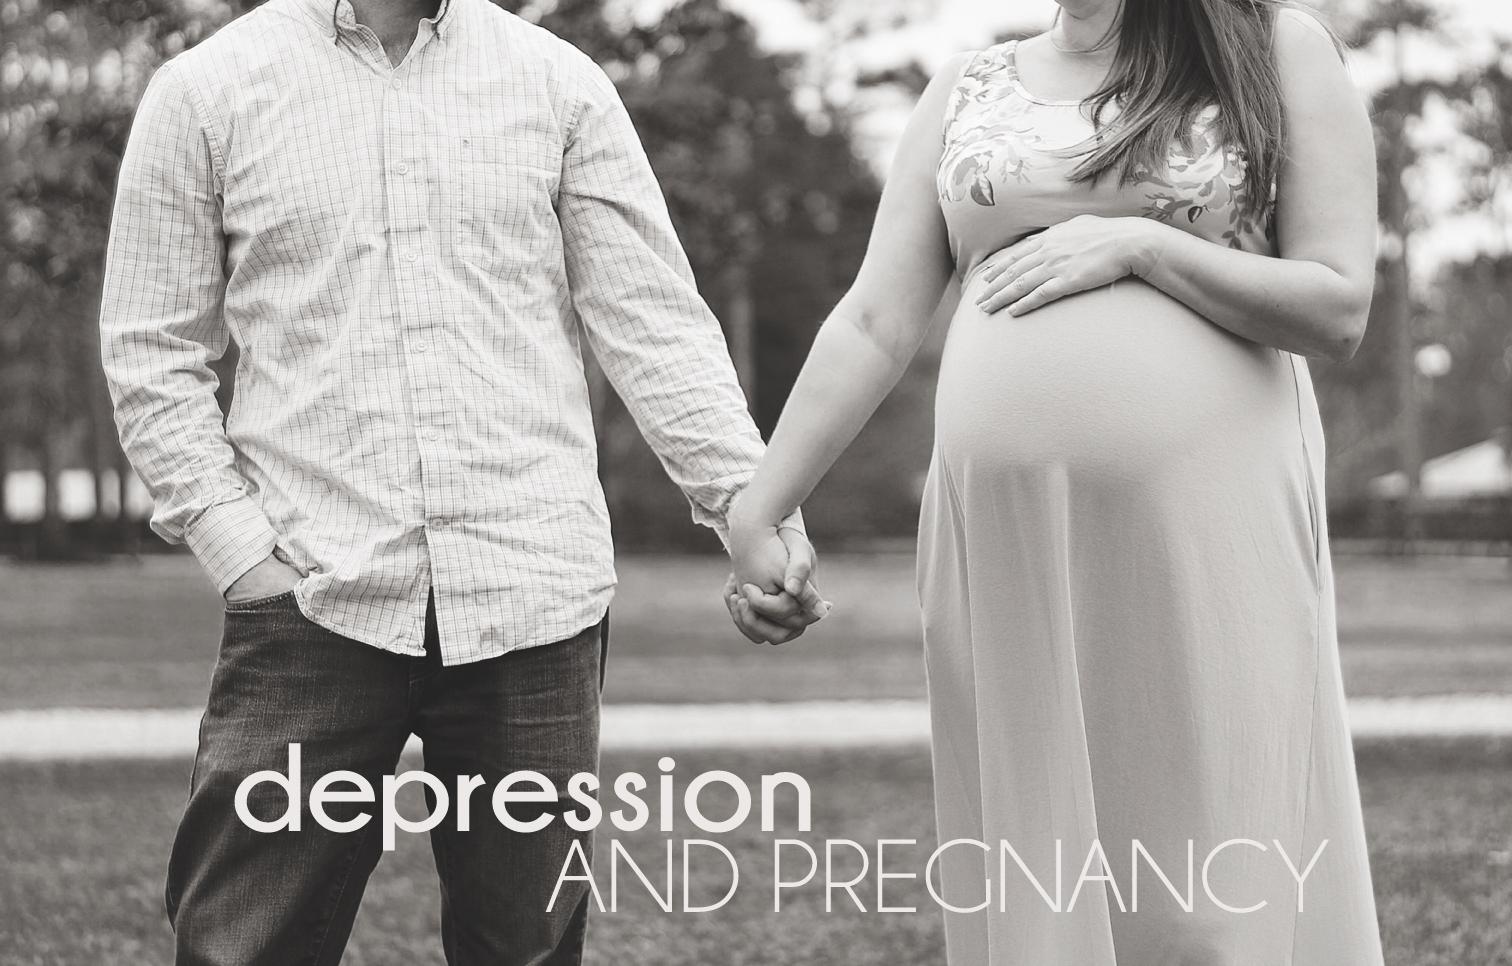 depressionpost1.jpg